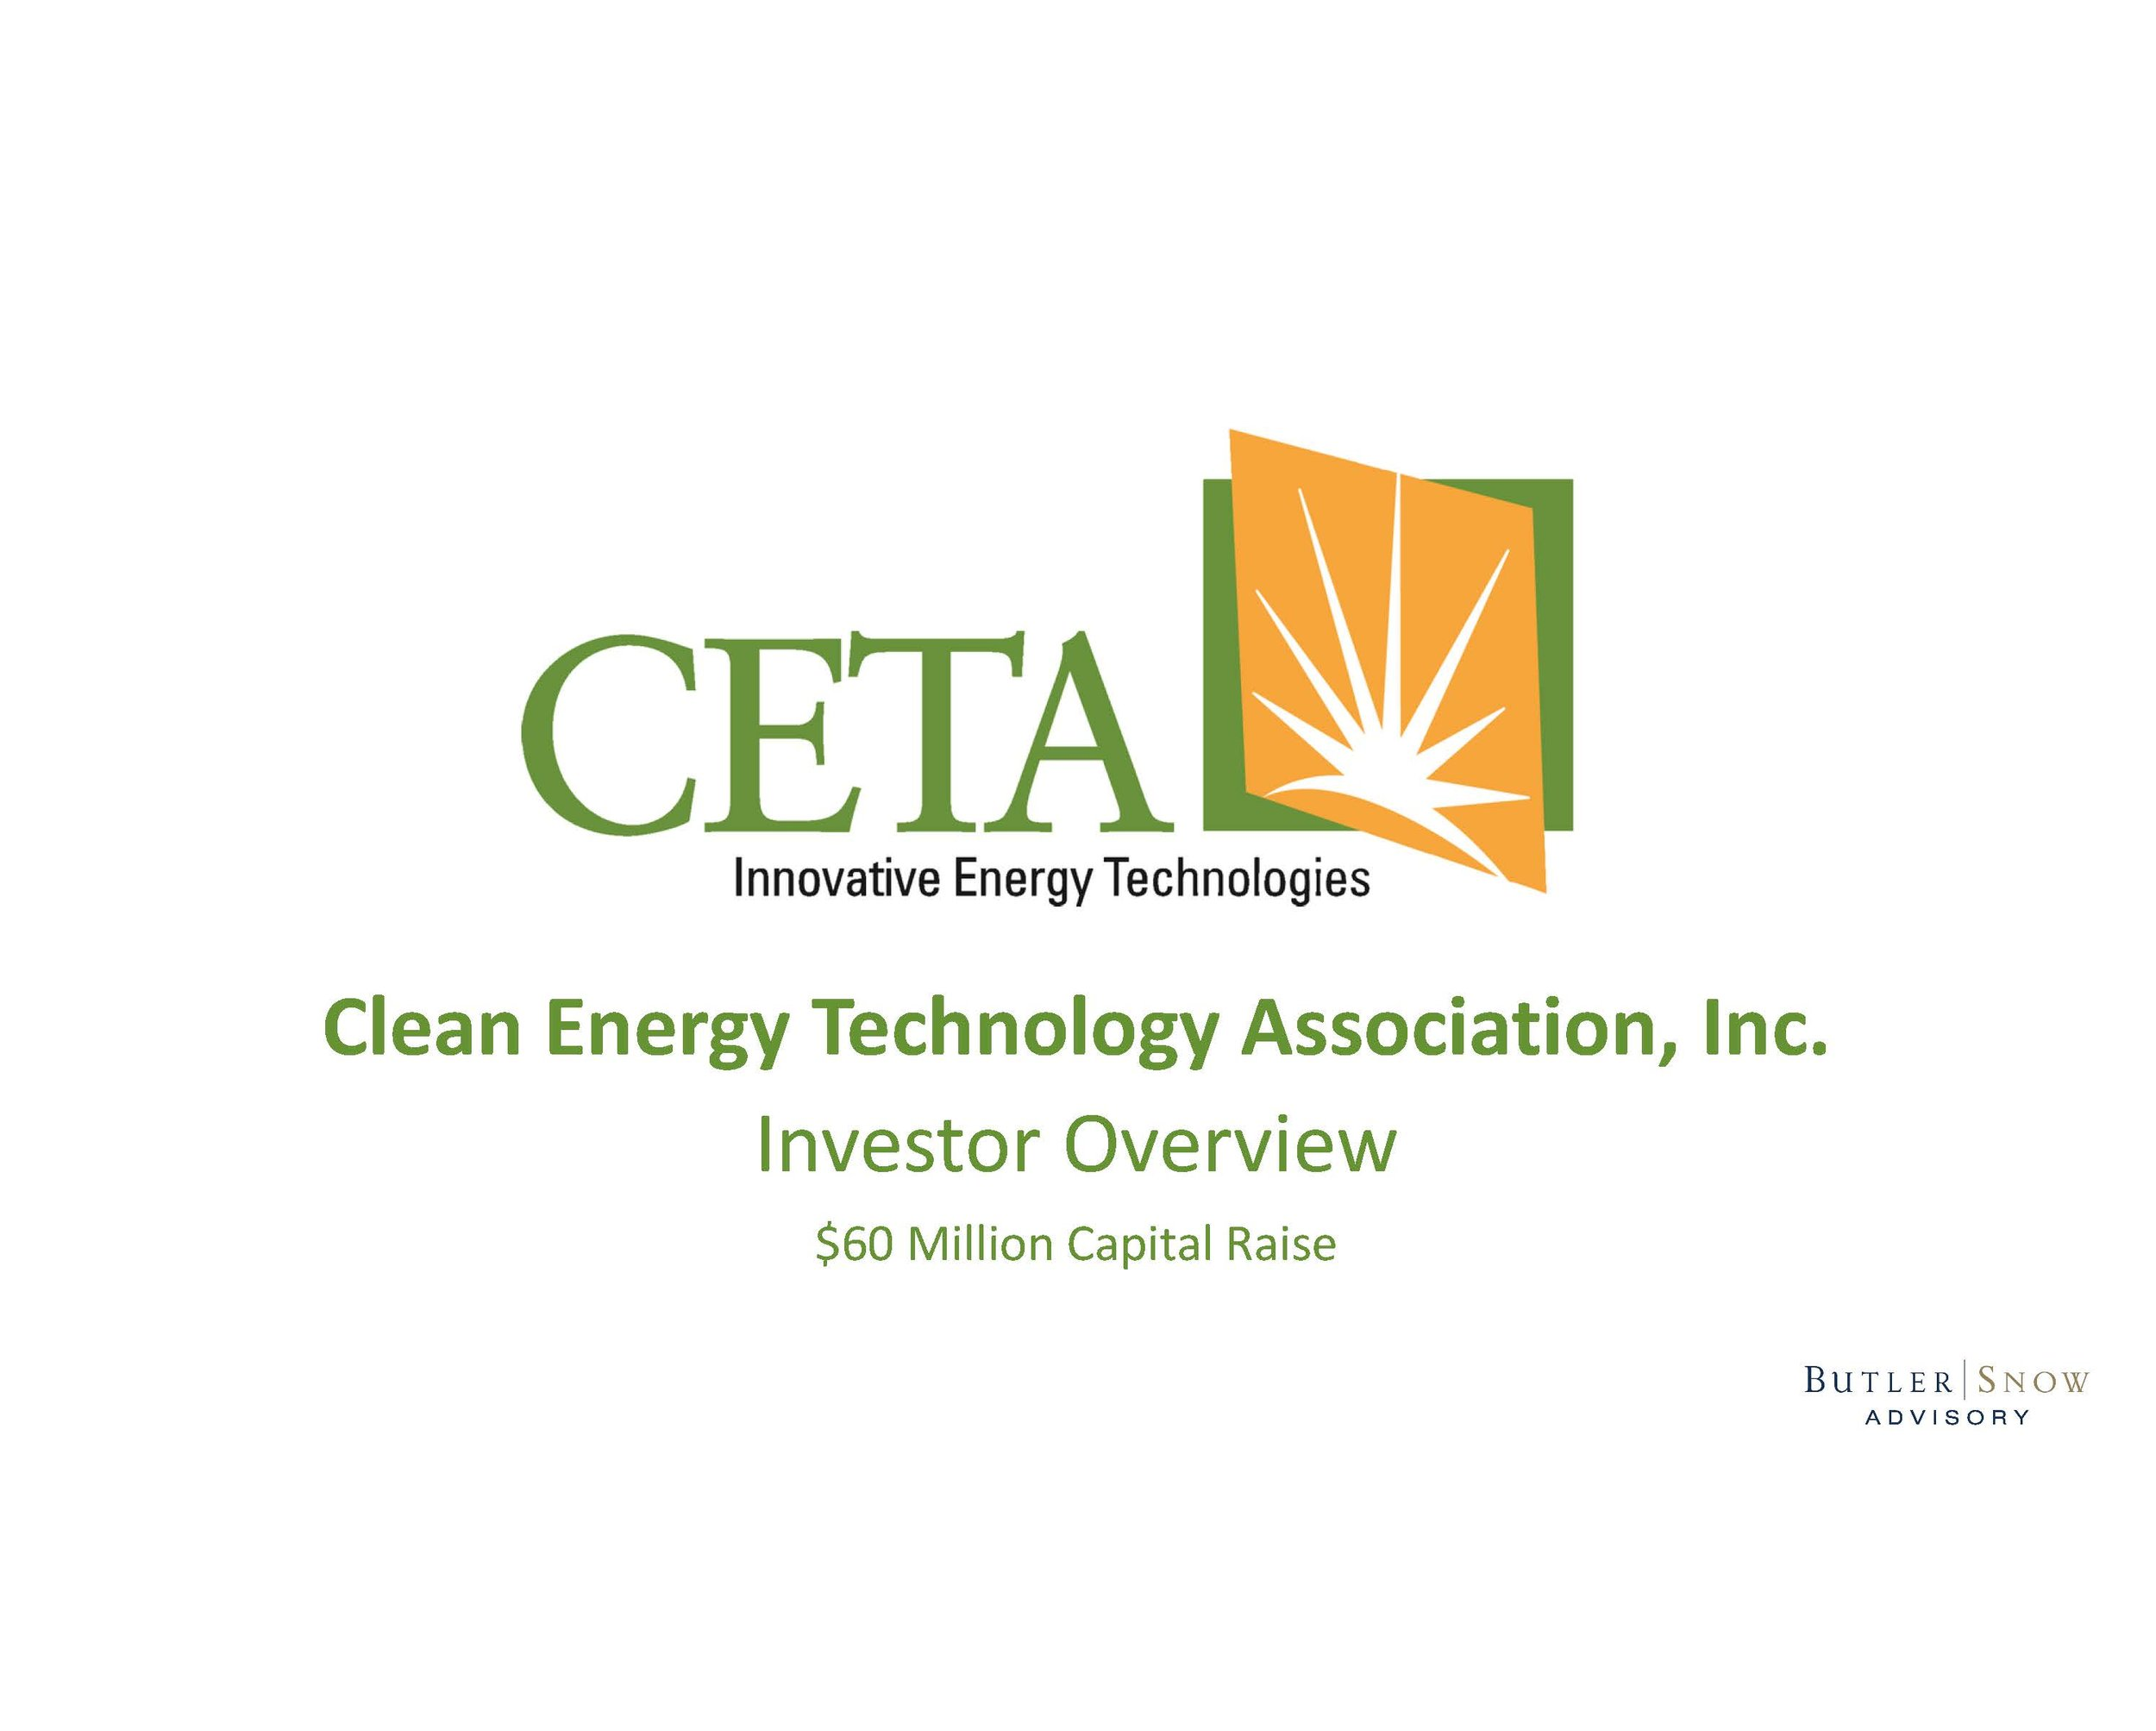 CETA.Overview$60Mil_Page_01.jpg